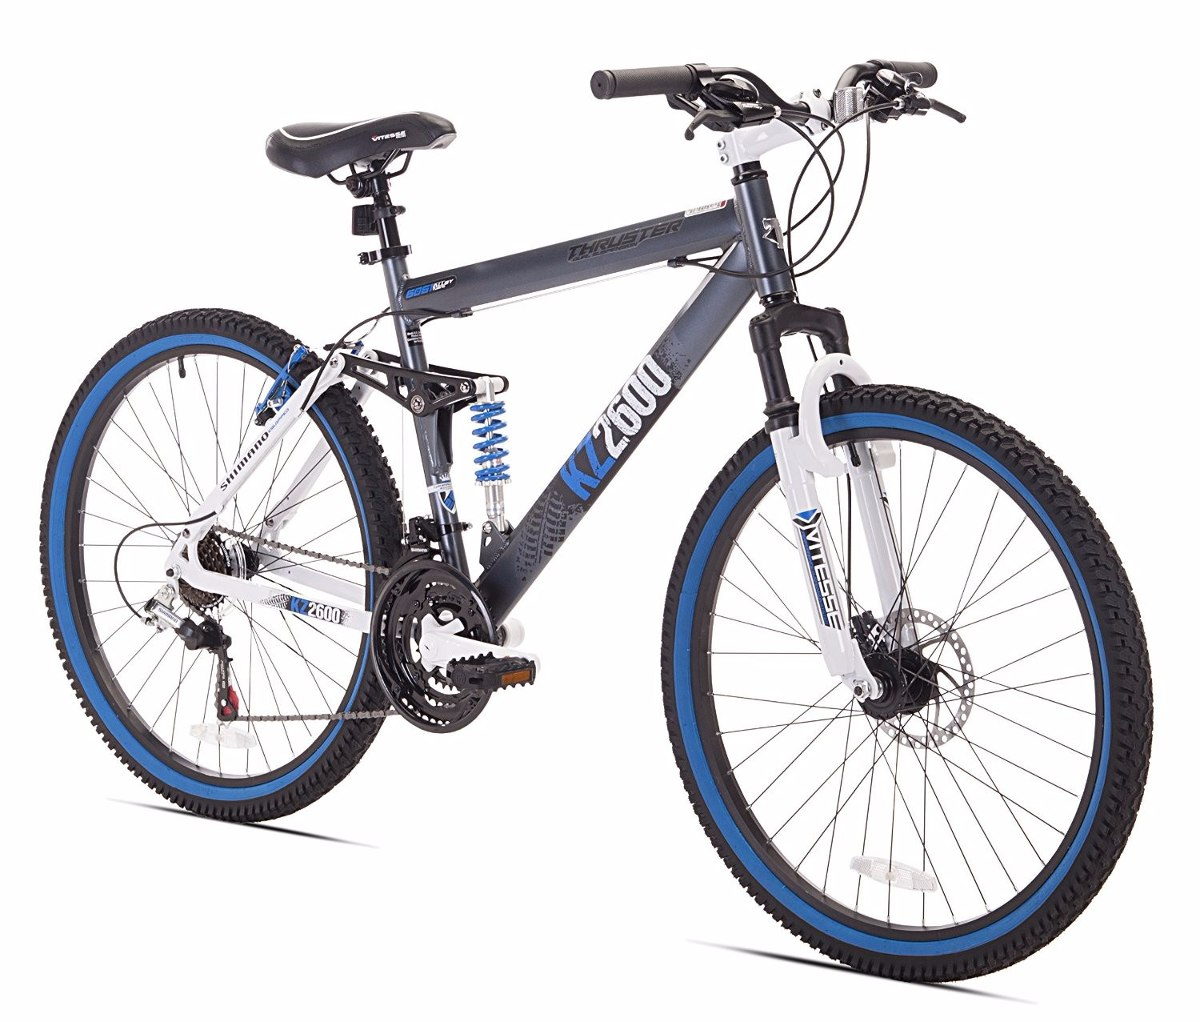 Bicicleta De Montaña De Doble Suspension 26 Pulg. Kent T ...